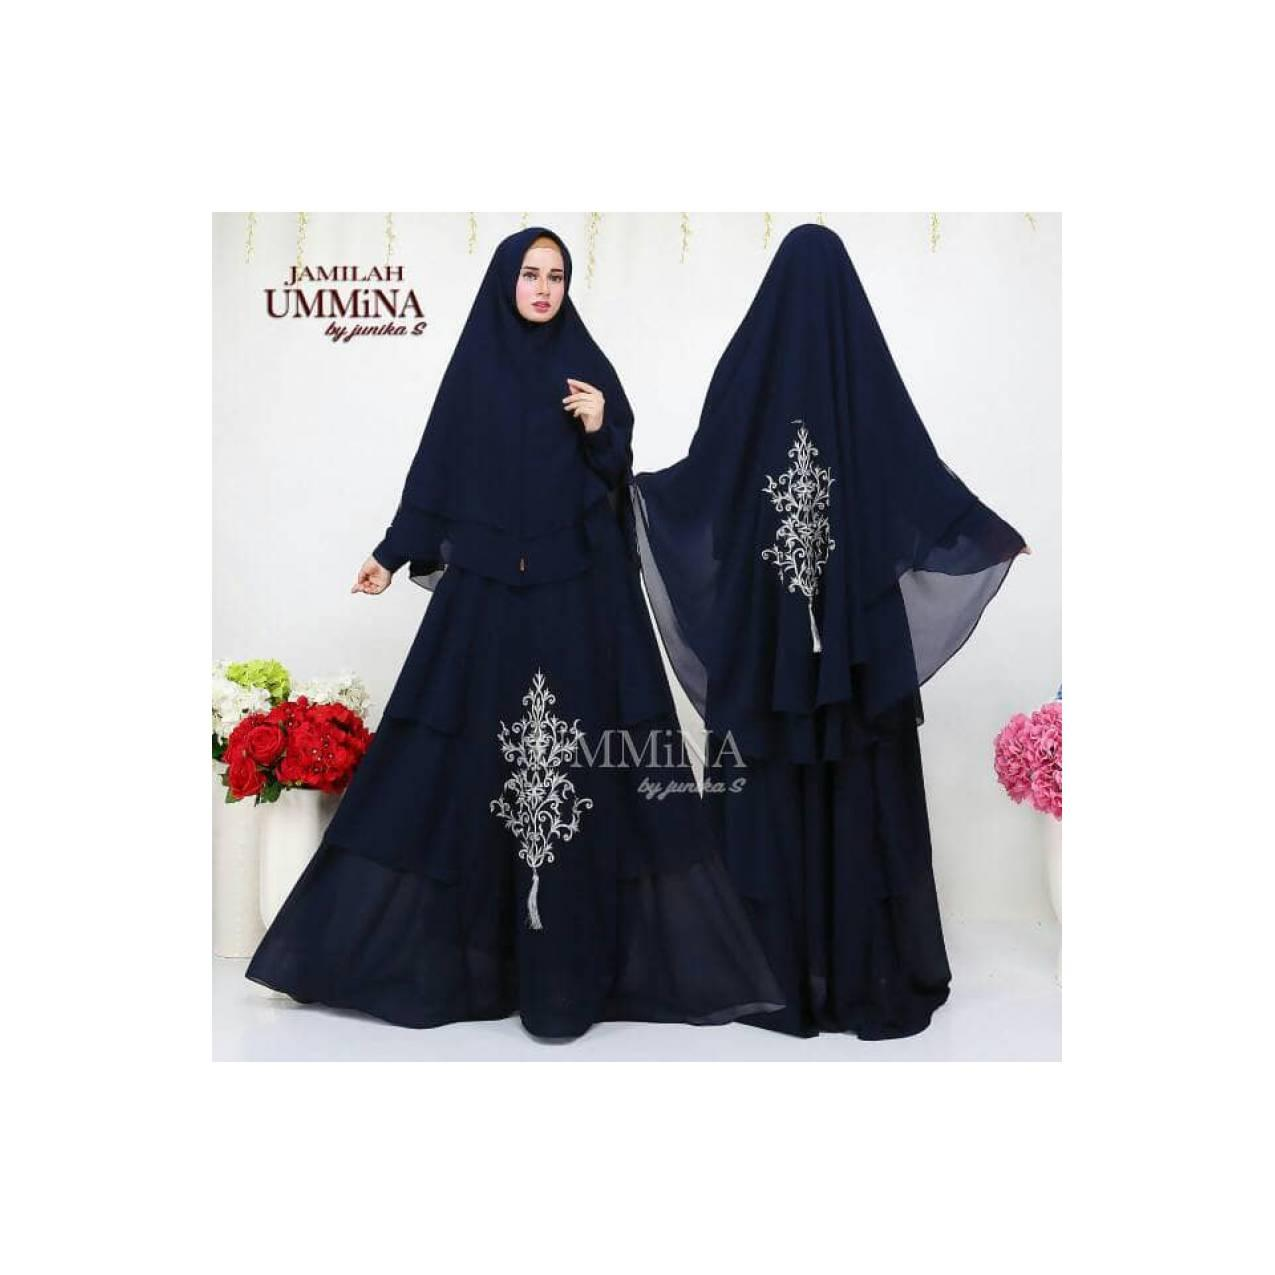 Busana Muslim Trendy, Jamilah by Ummina